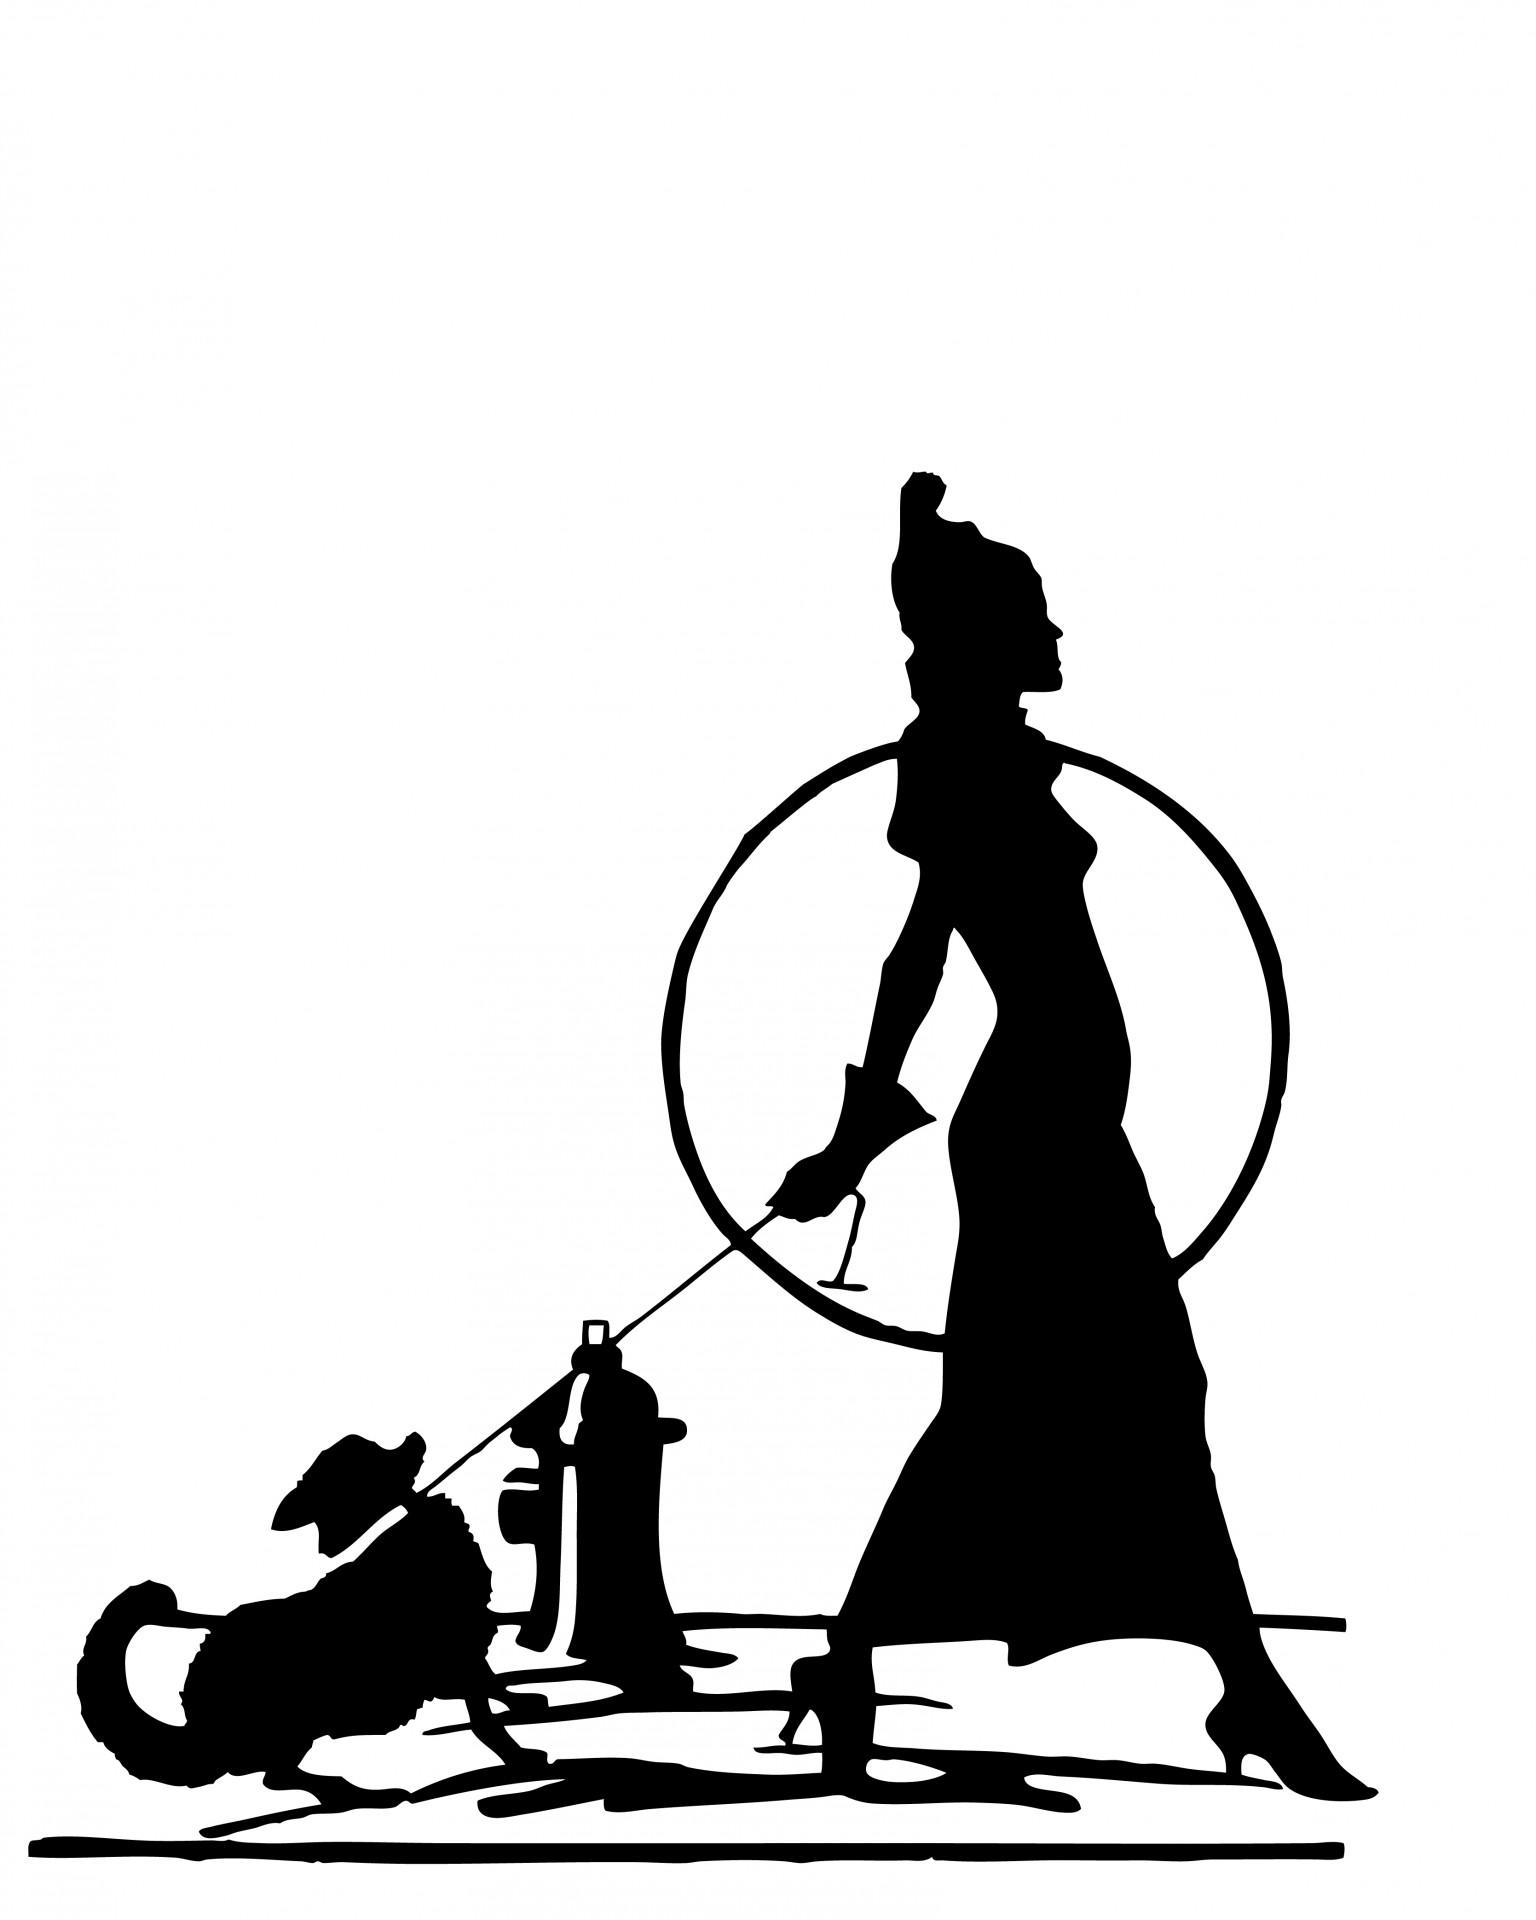 Woman Walking Dog Silhouette Free Stock Photo